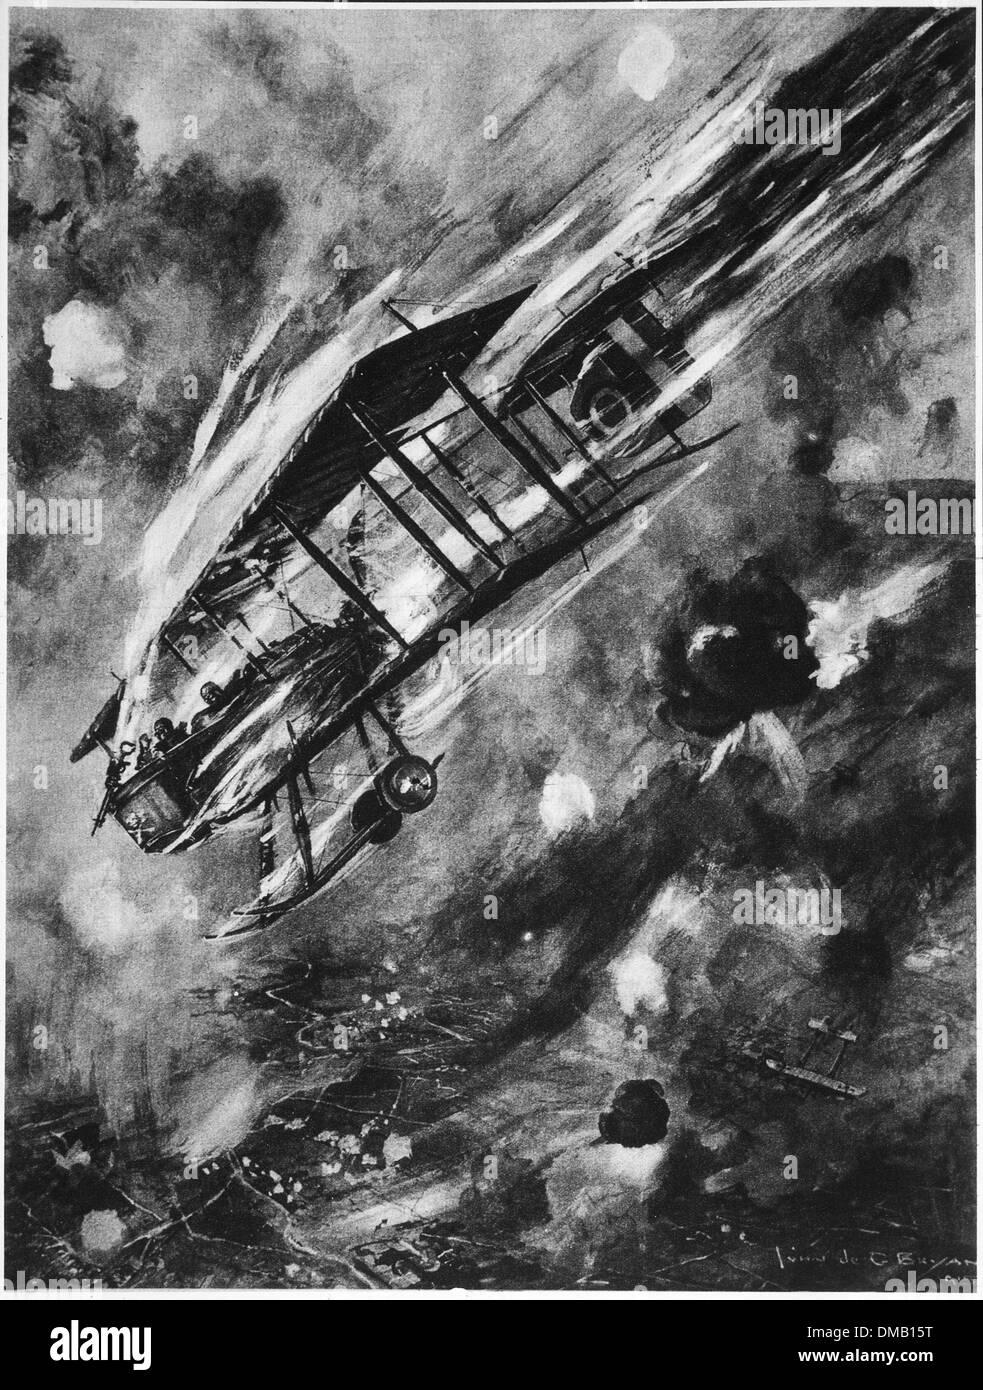 Air Battle between English and German Bi-Planes, 1915 - Stock Image